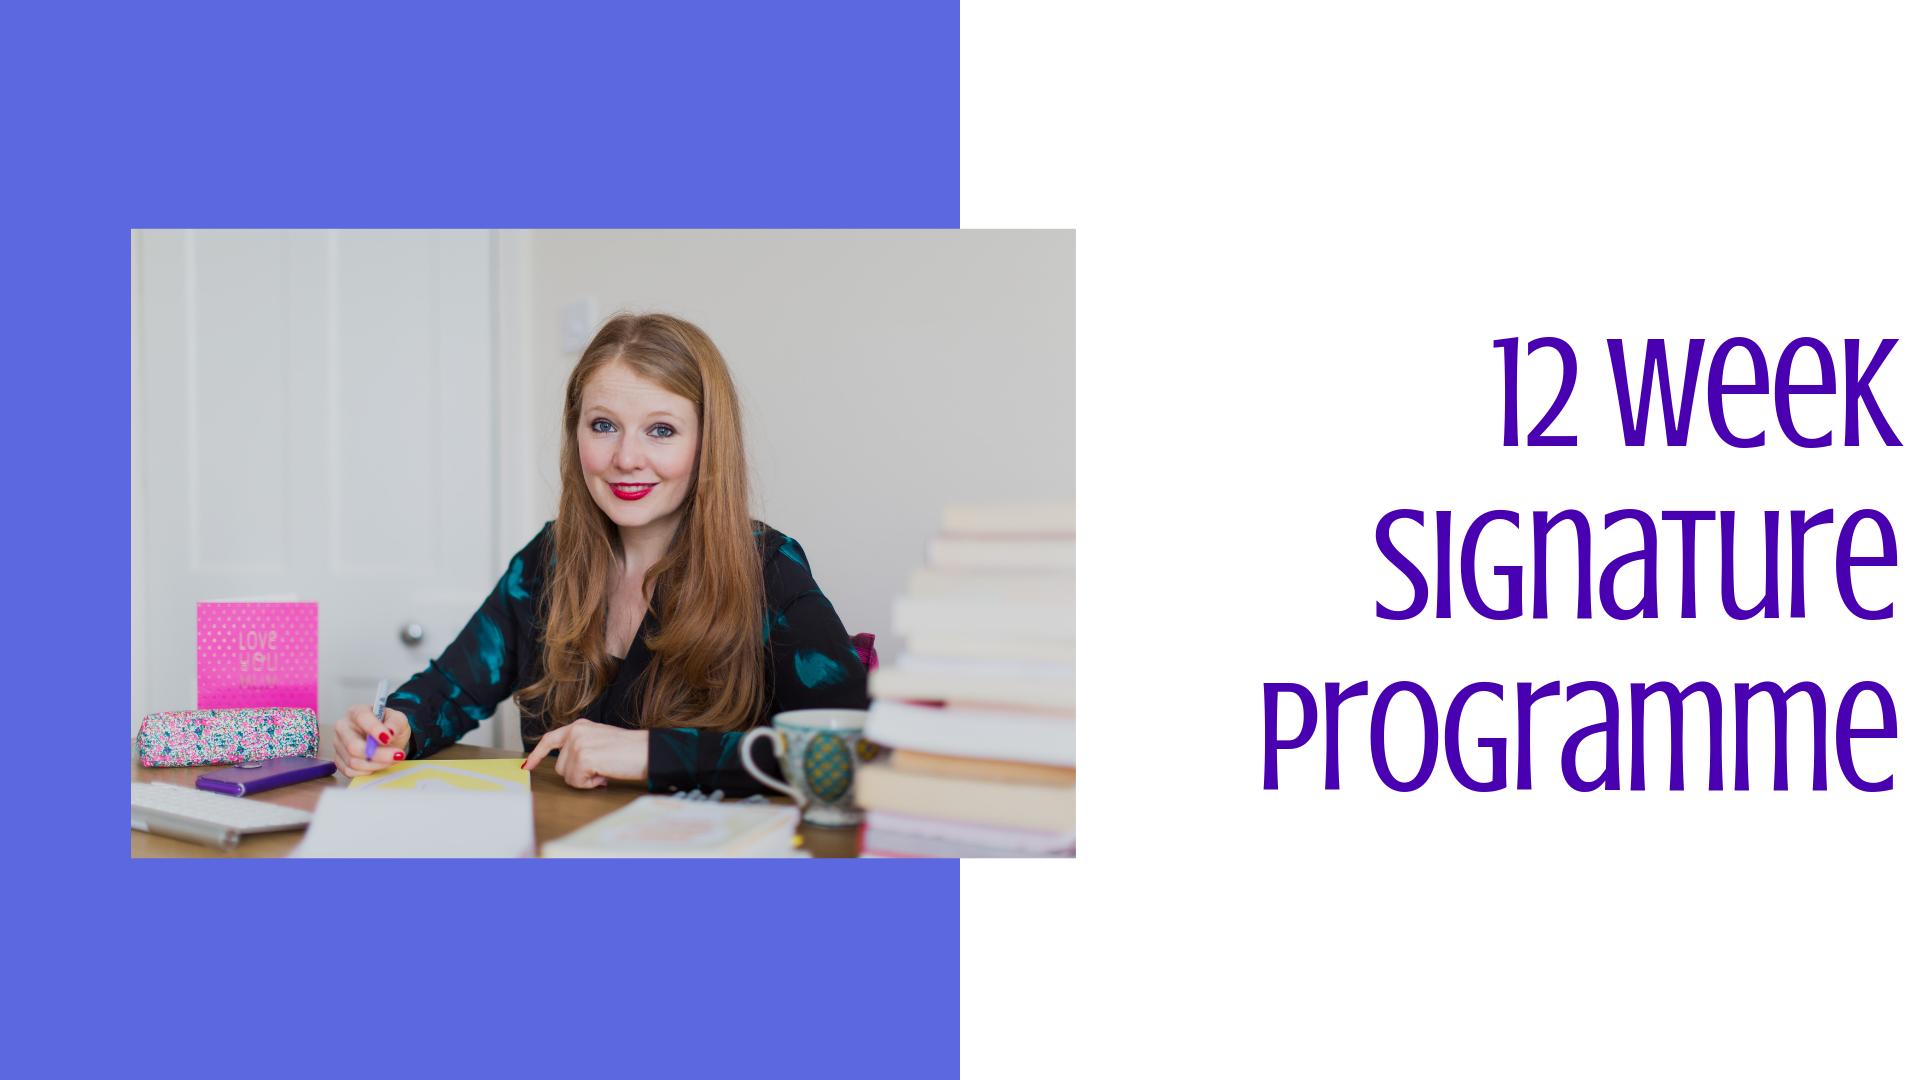 12 week signature progamme